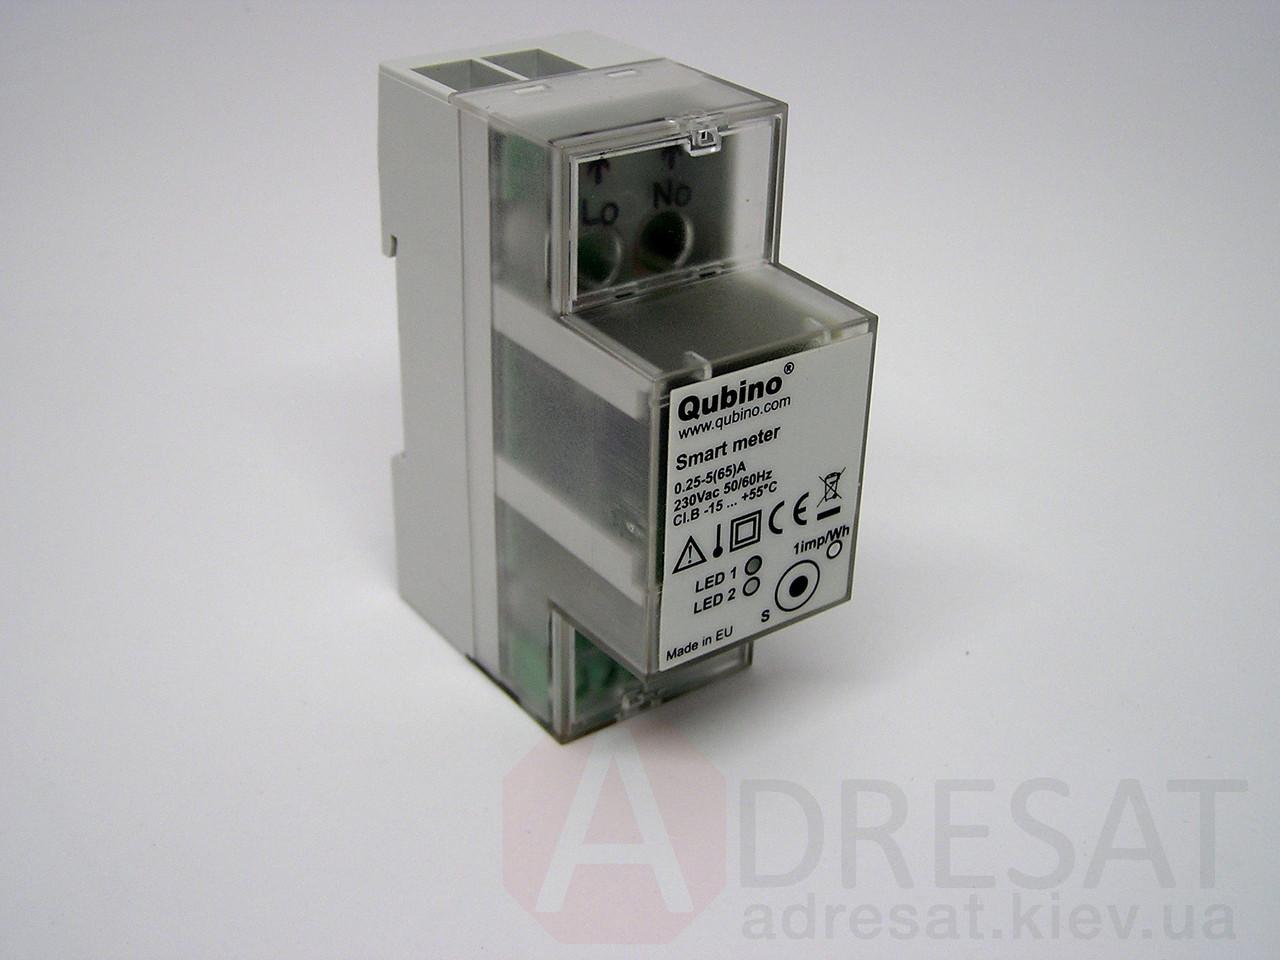 ZMNHTD1, Qubino Smart Meter, Z-Wave вимірювач енергоспоживання